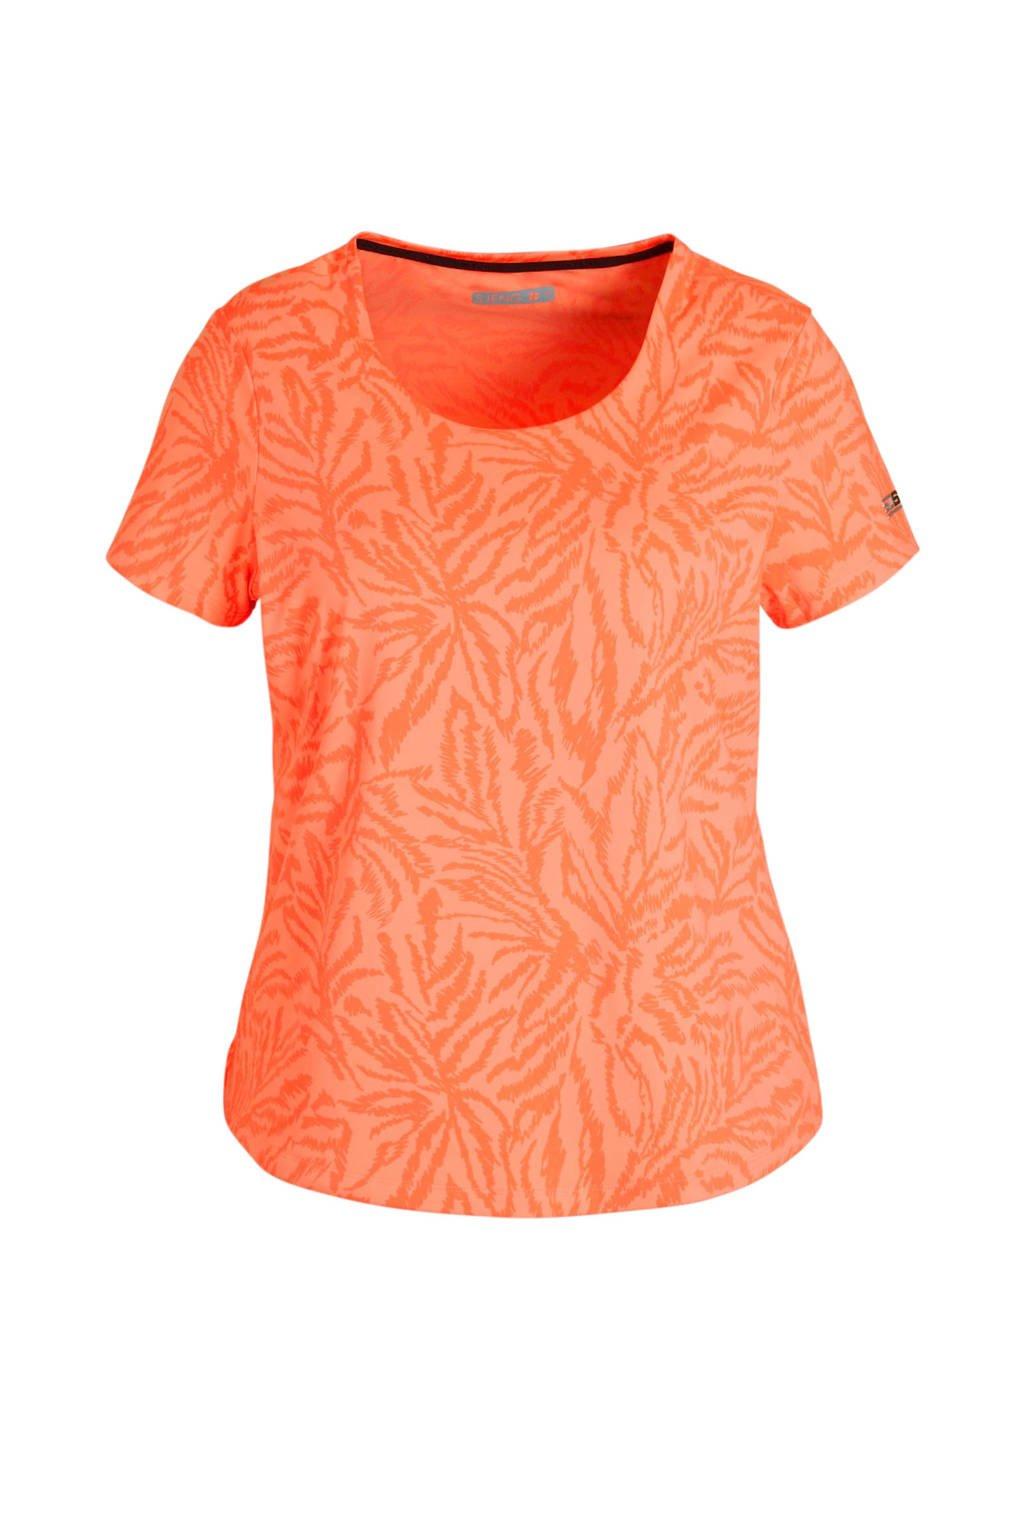 Sjeng Sports T-shirt Michelle Plus oranje, Oranje